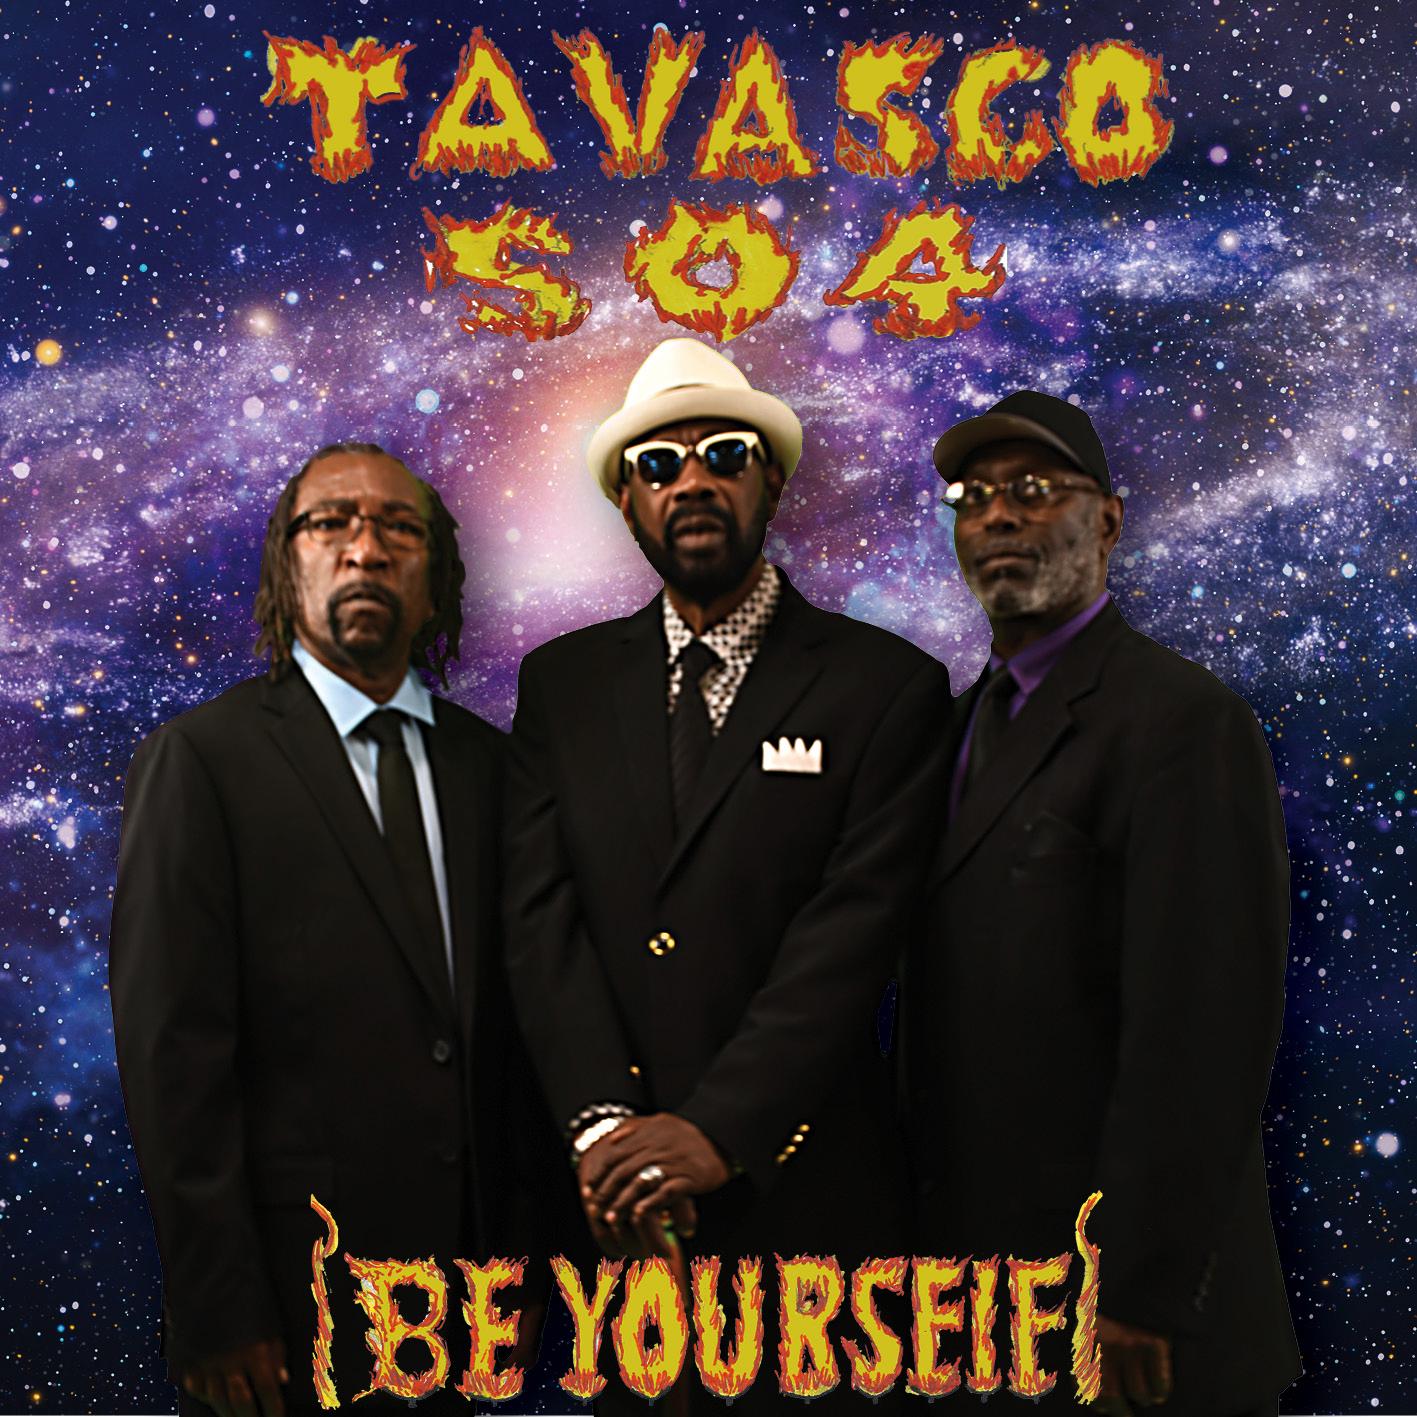 Tavasco CD 1